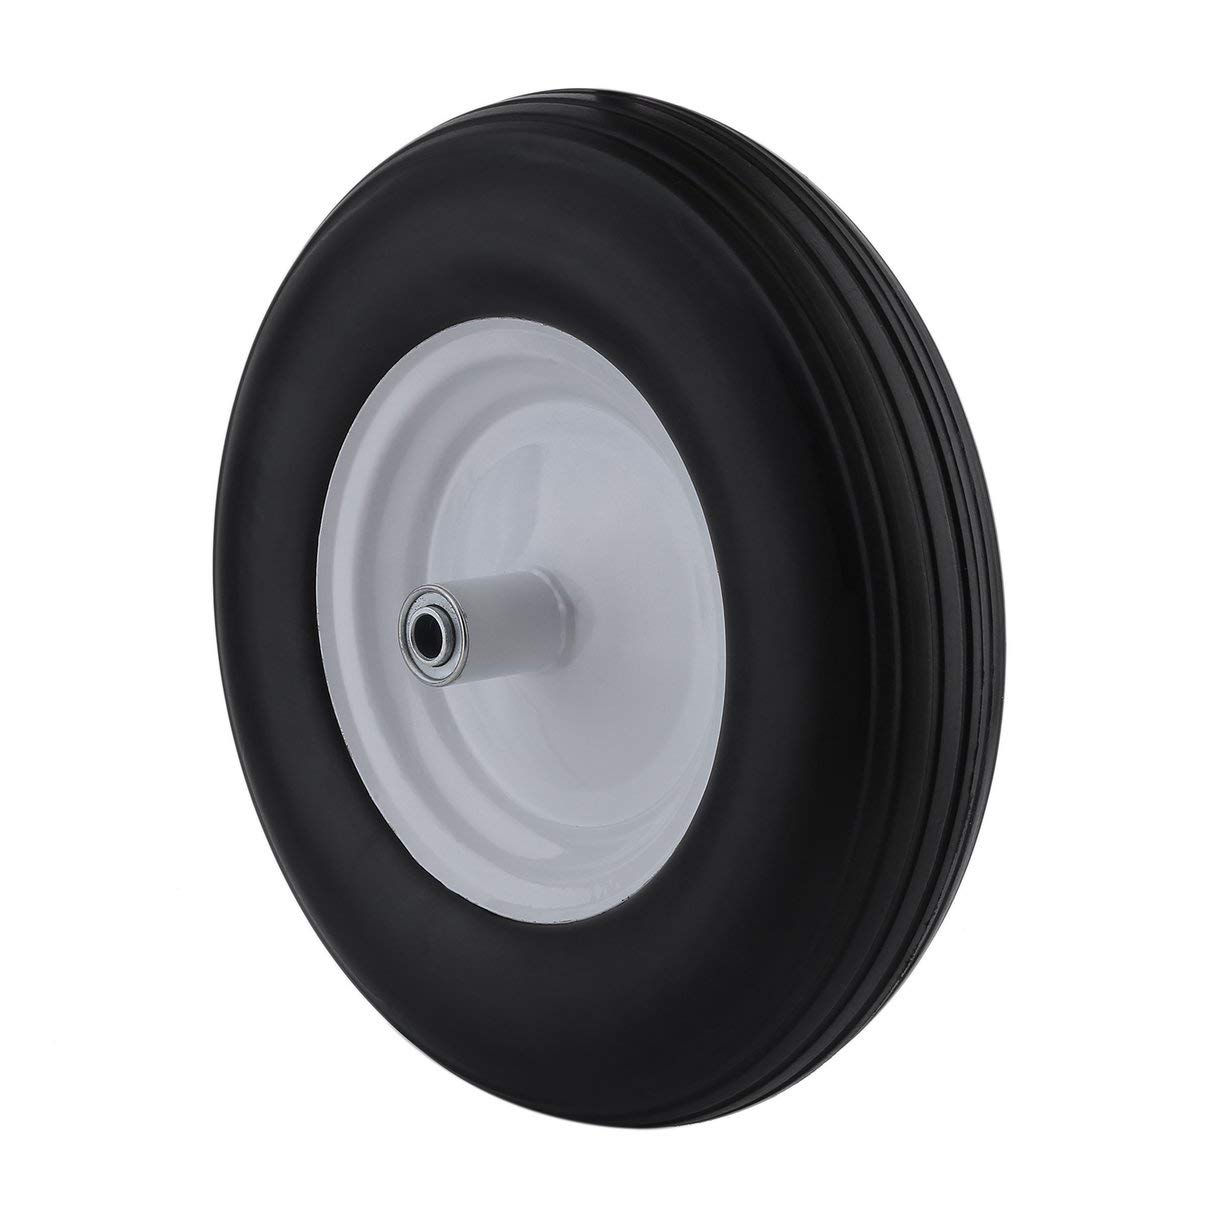 Rubber Wheelbarrow Tires 16 Inch Cart Wheel Tyre Heavy Duty Solid Tire Wheel Barrow Replacement Wheel Wagon Tyre